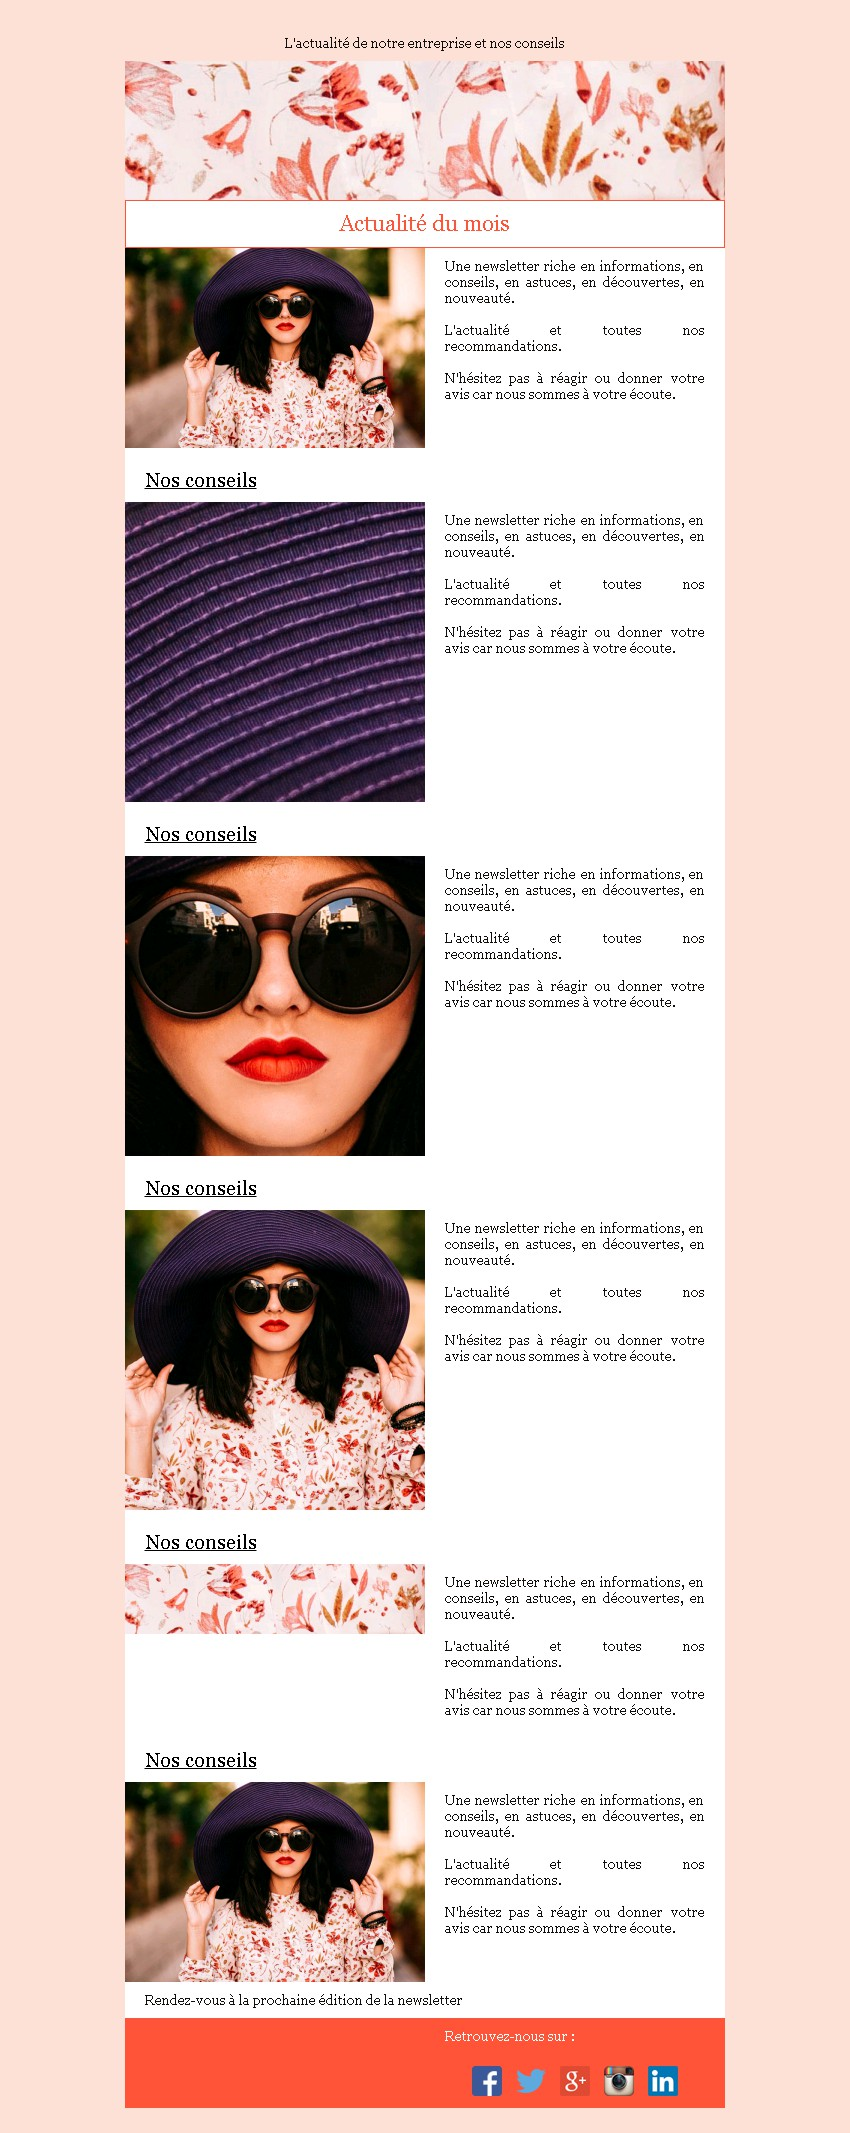 Newsletter sobre et image